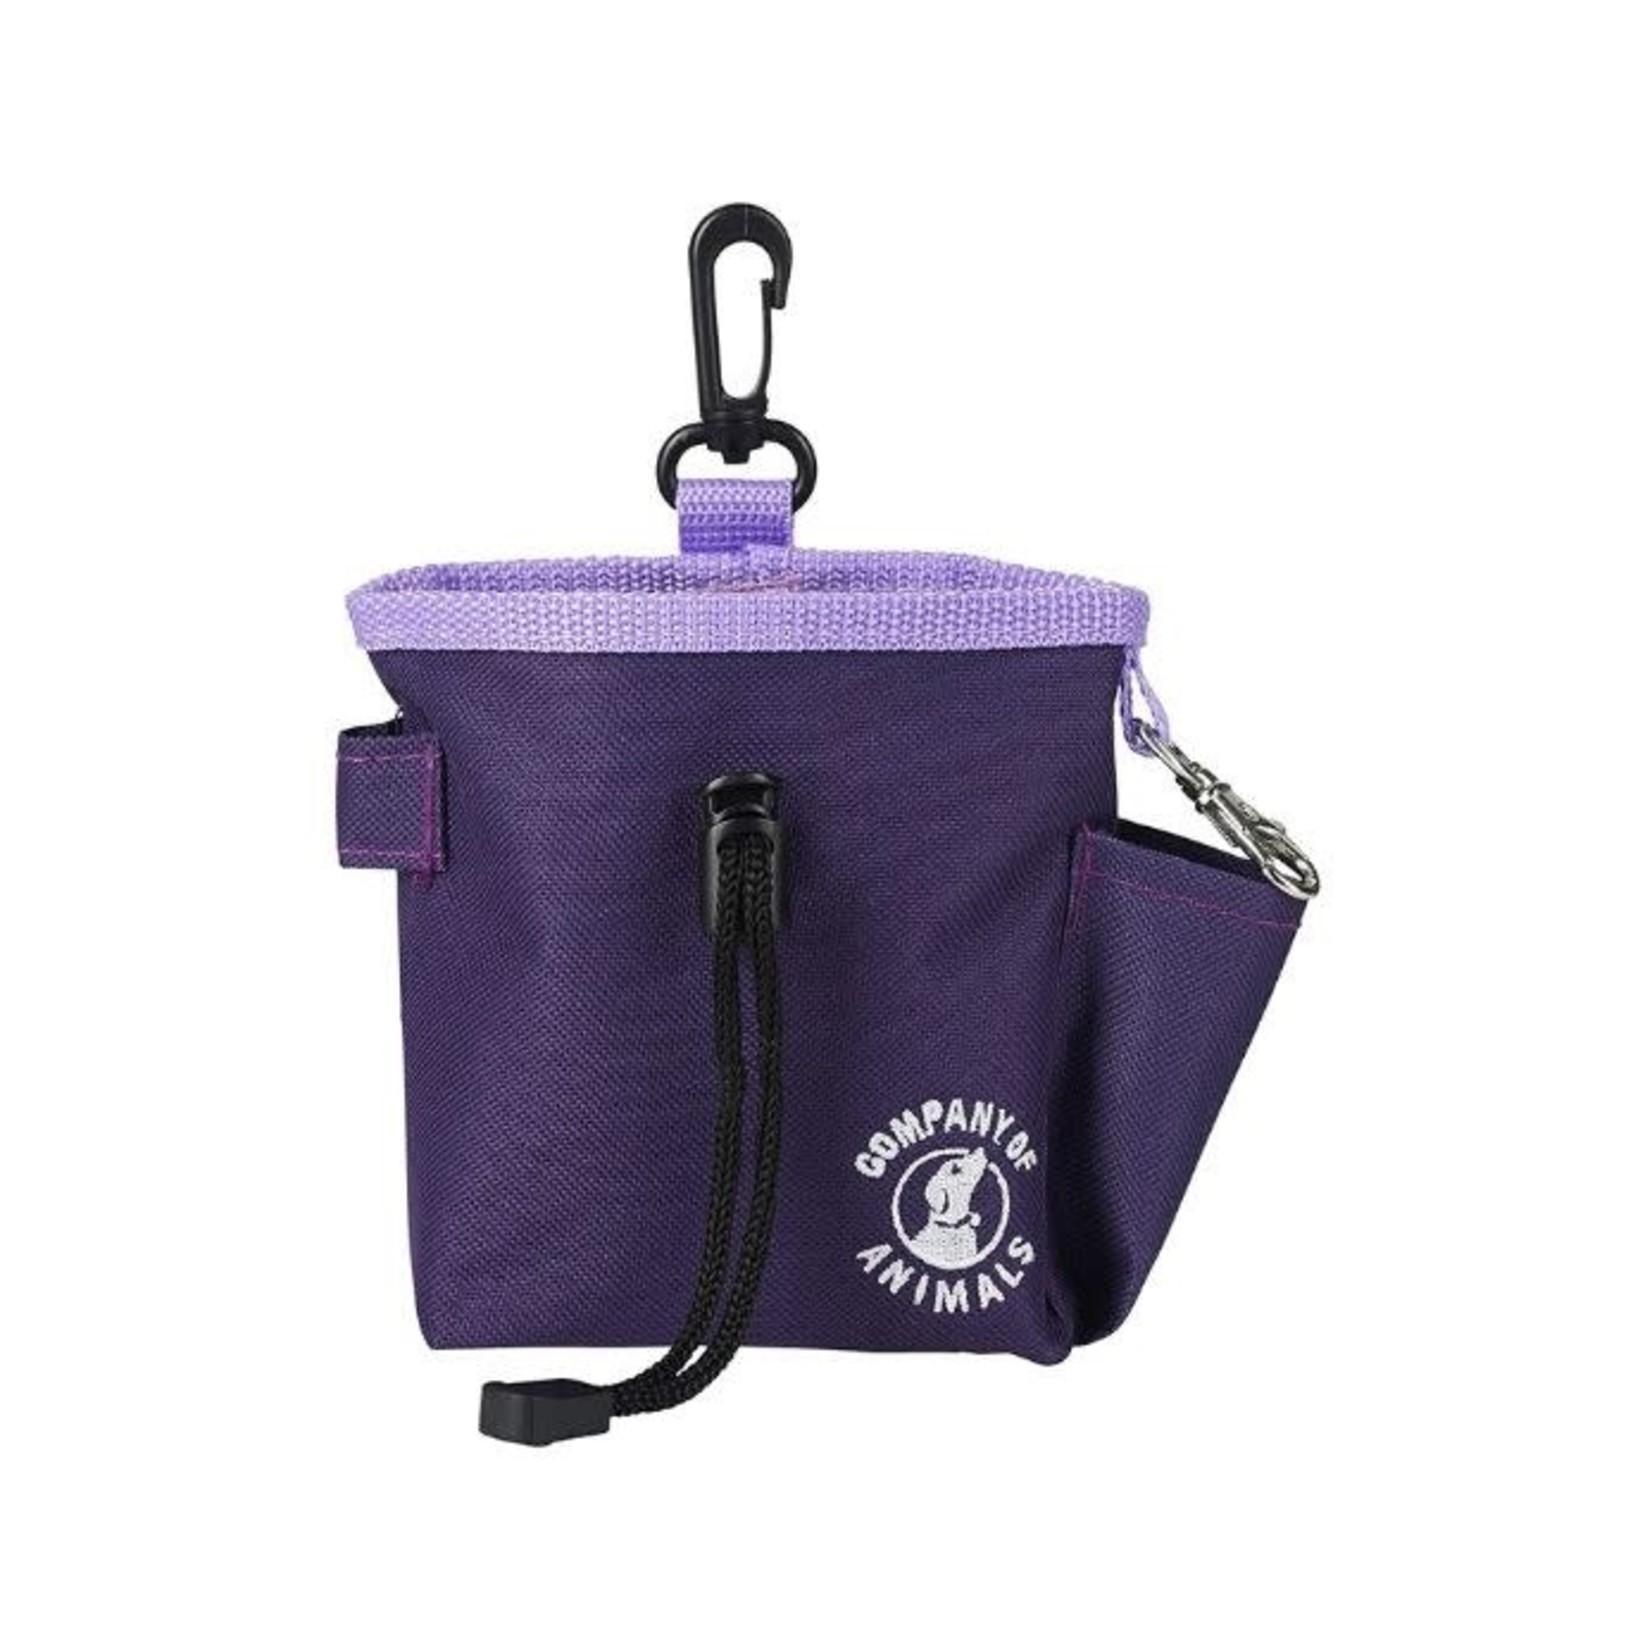 Company of Animals Dog Training Treat Bag, Purple